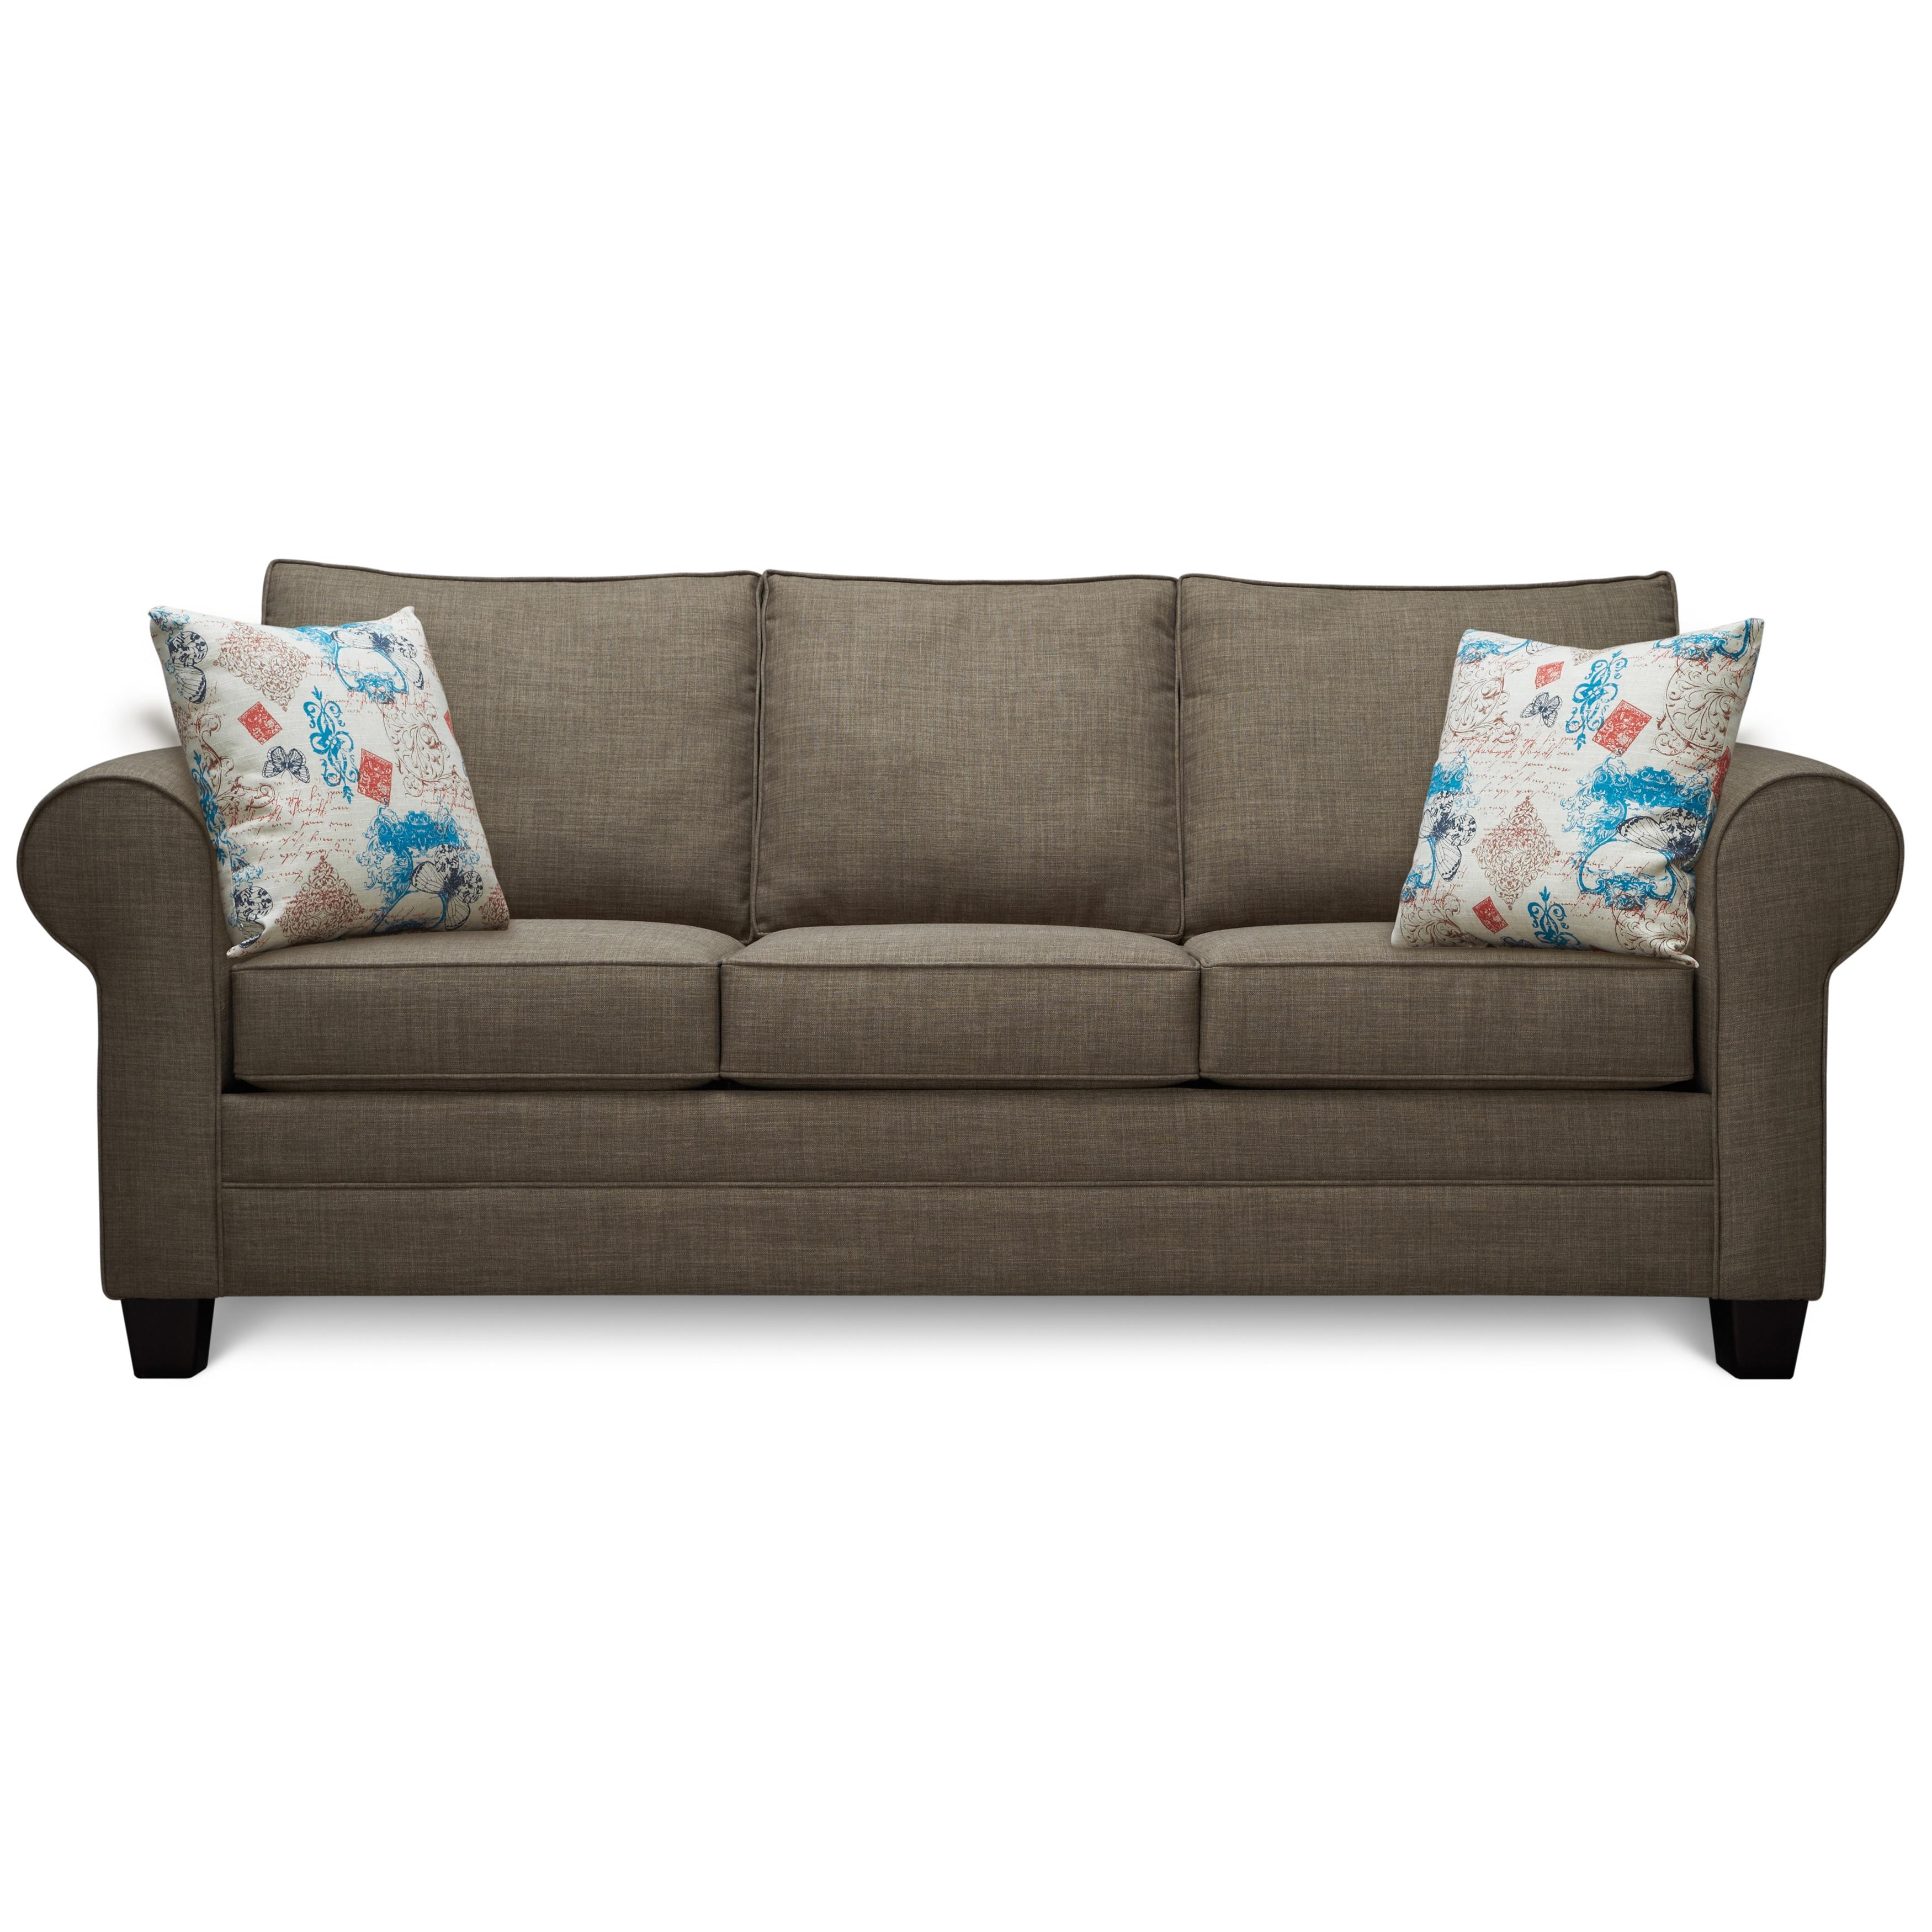 Art Van Saxon Stone Sofa With Accent Pillows